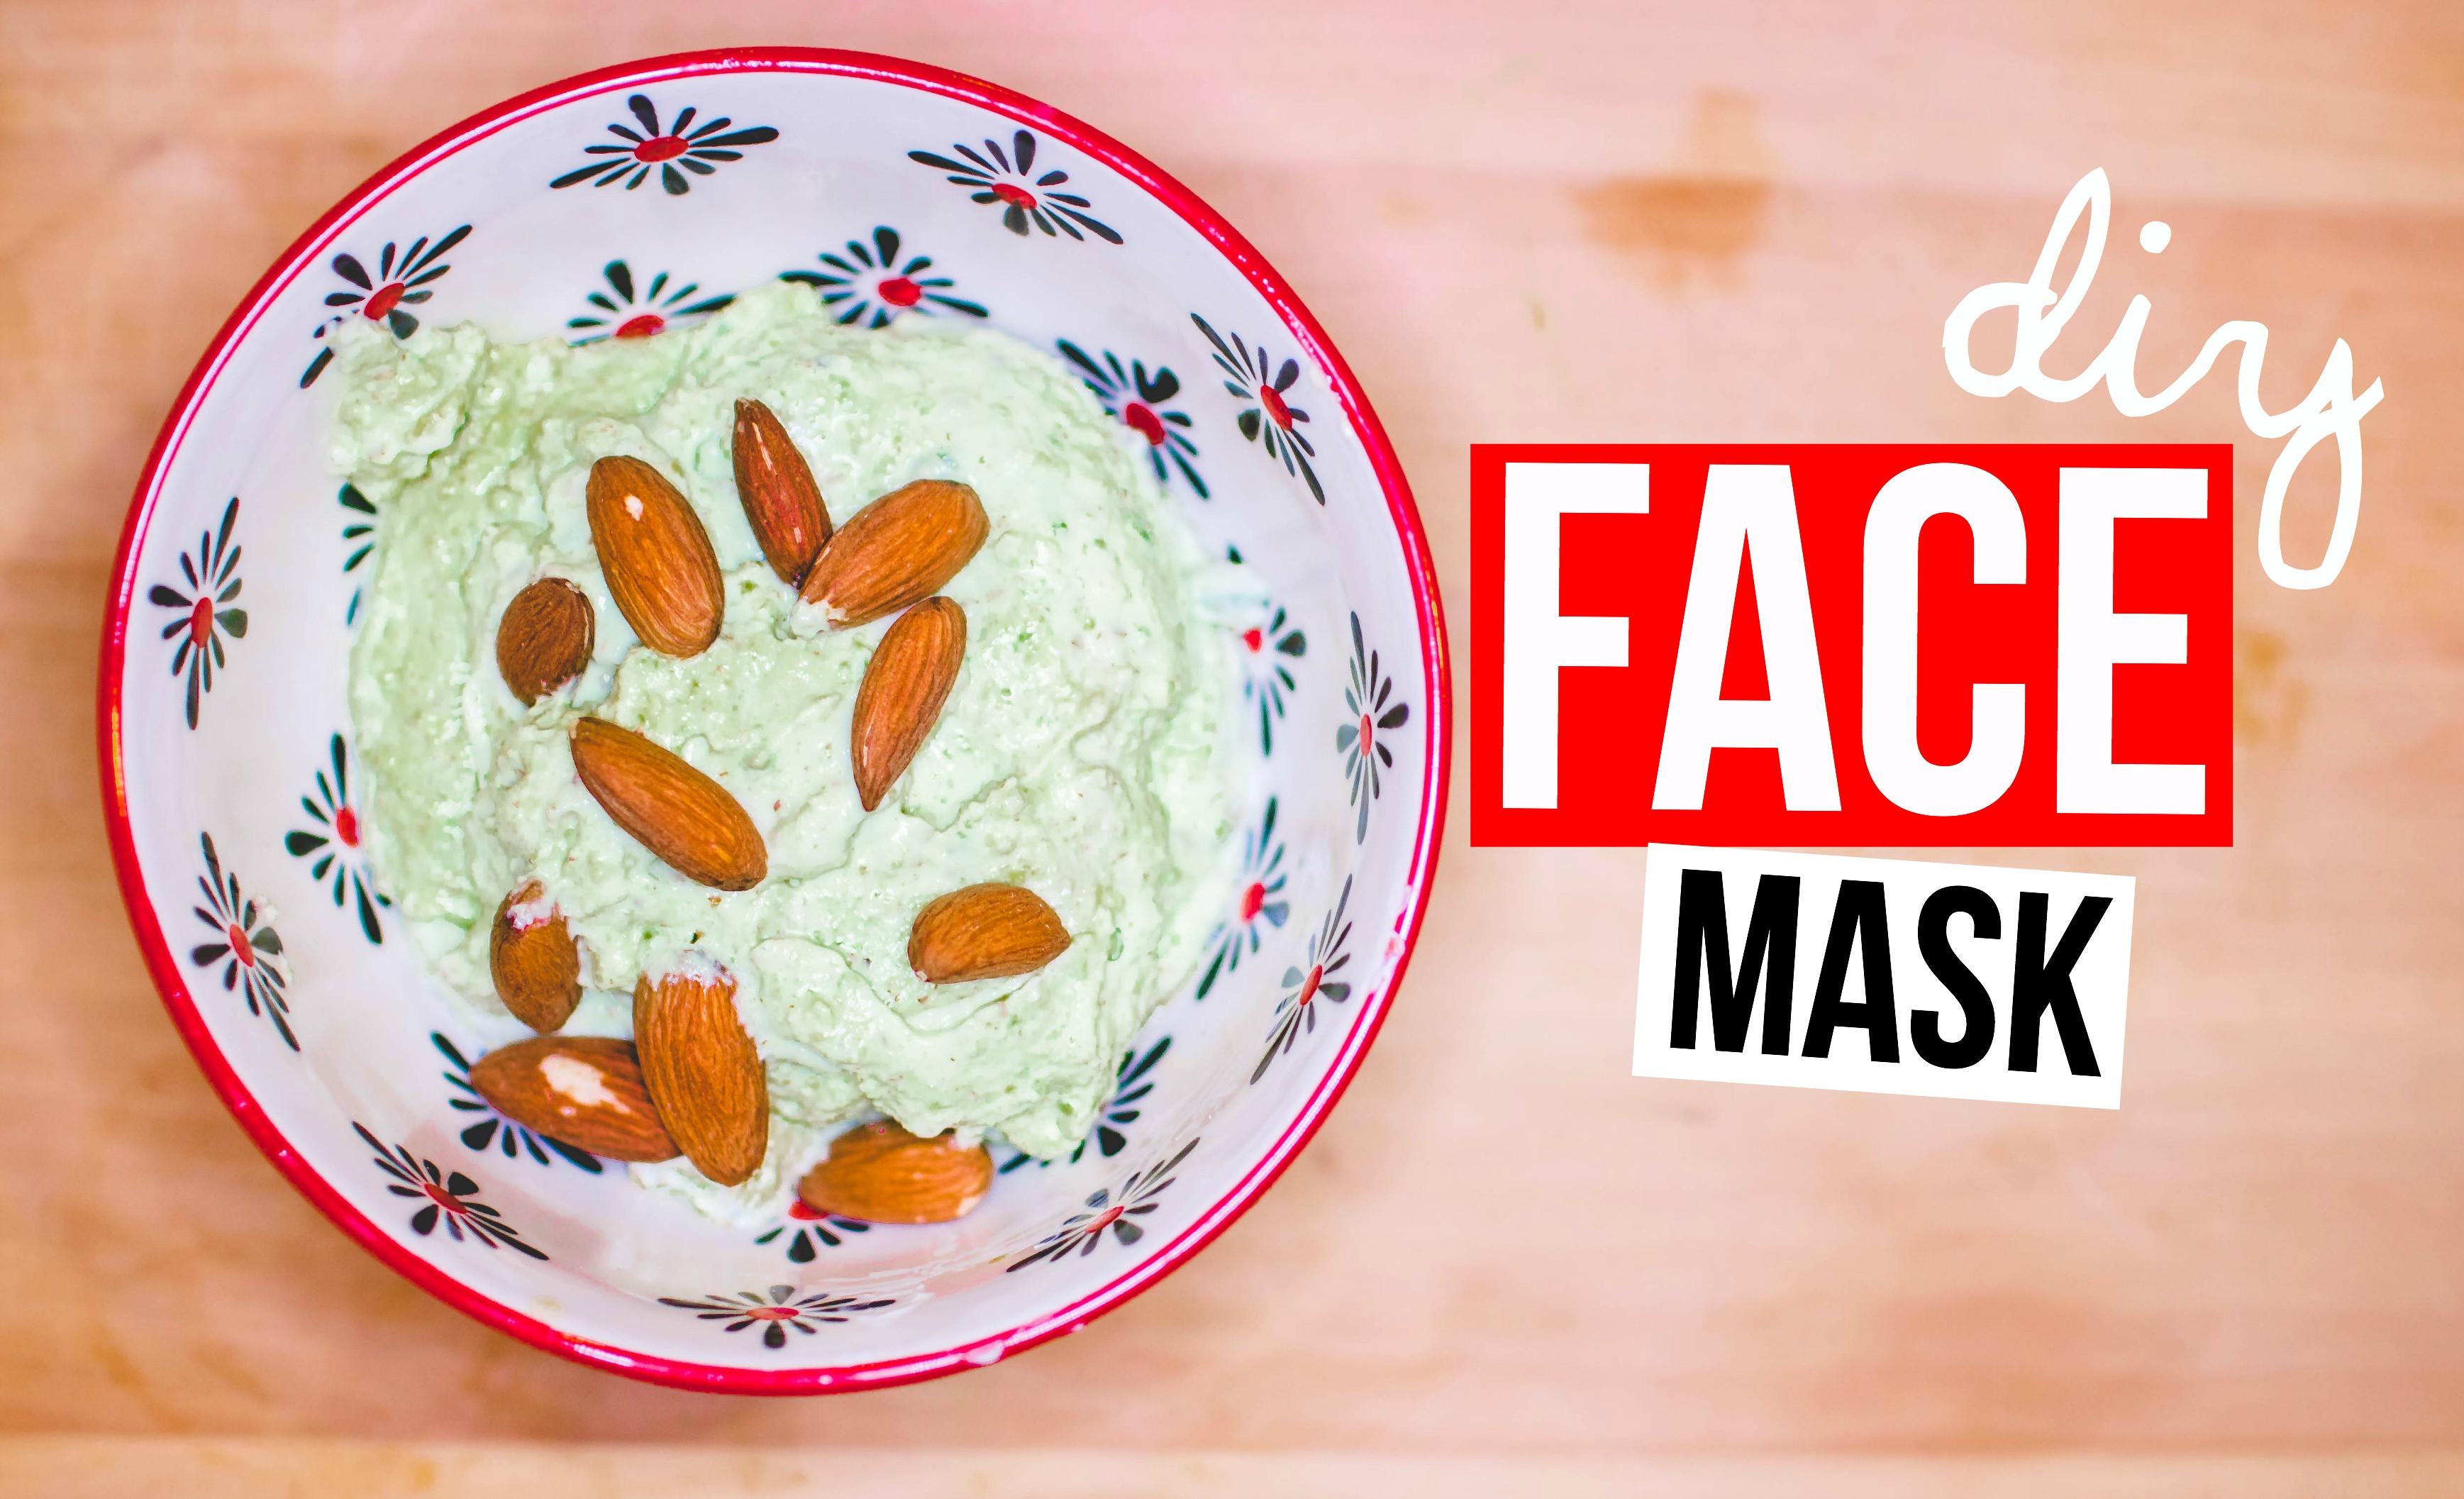 DIY Lush Face Mask  1 Minute Easy DIY Lush Inspired Face Mask – MyLifeAsEva